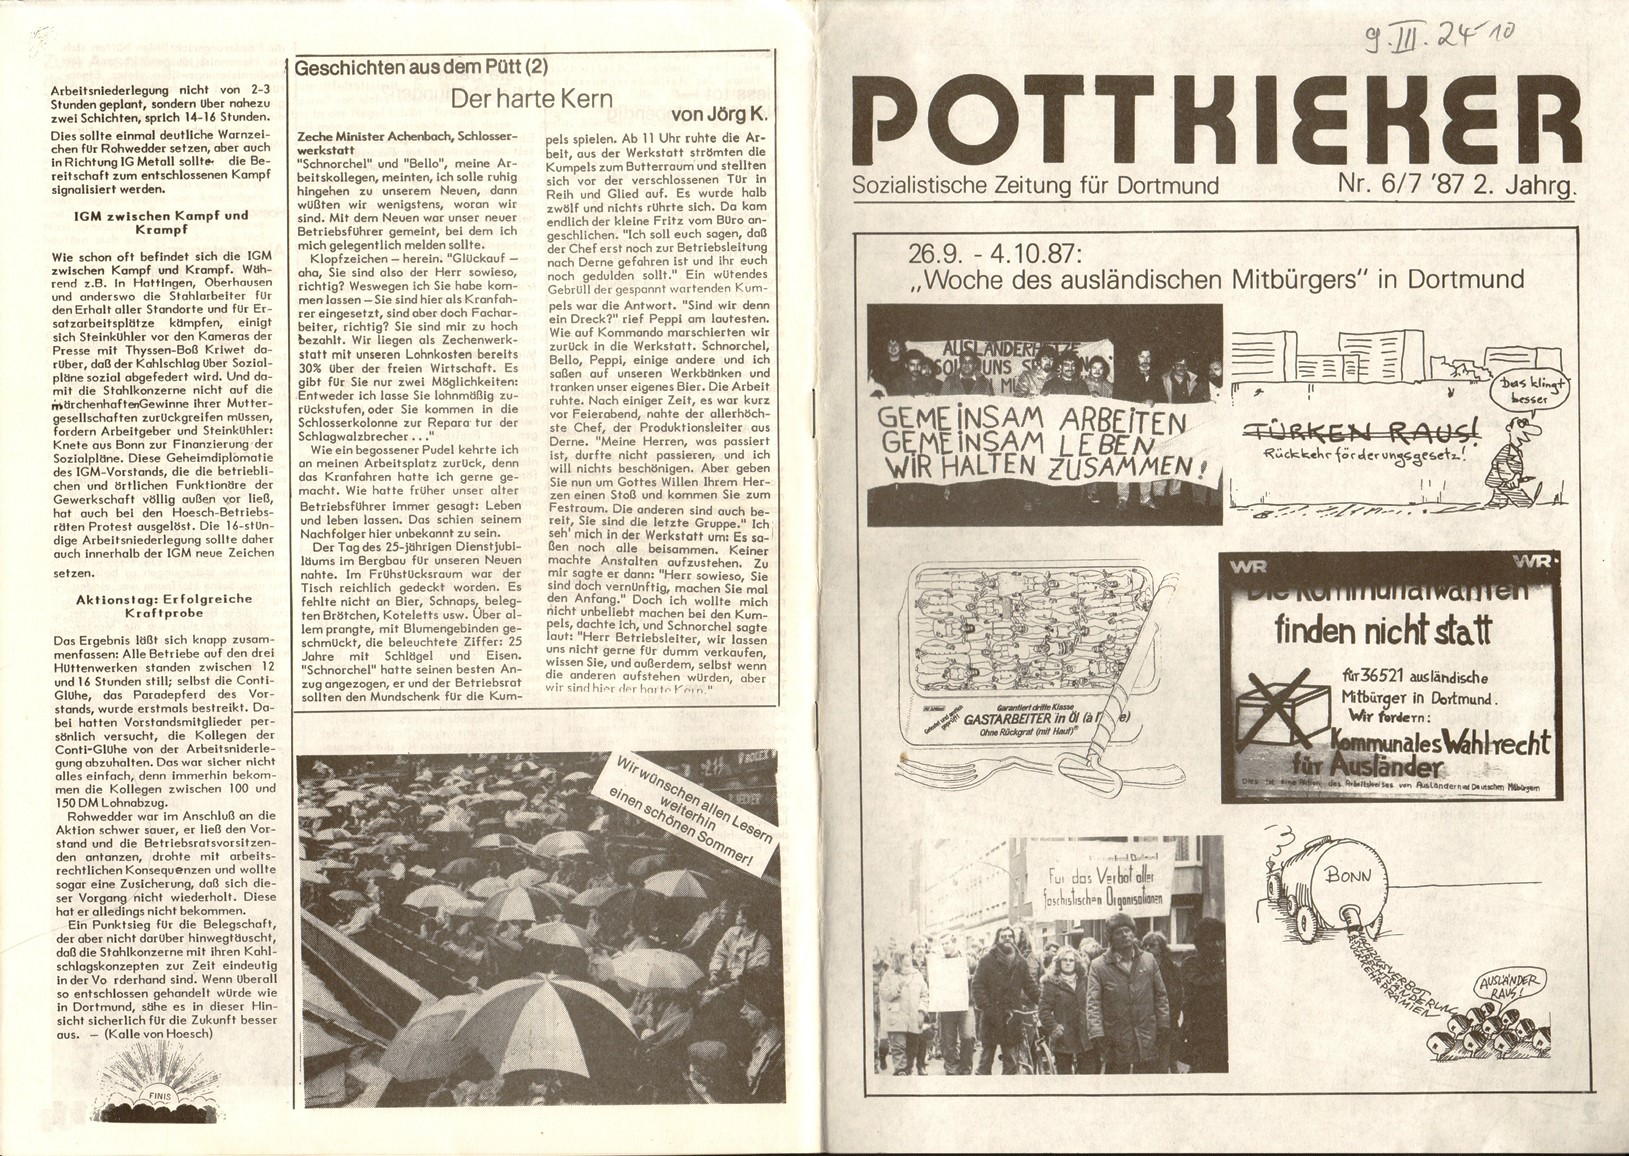 Dortmund_Pottkieker_19870900_01